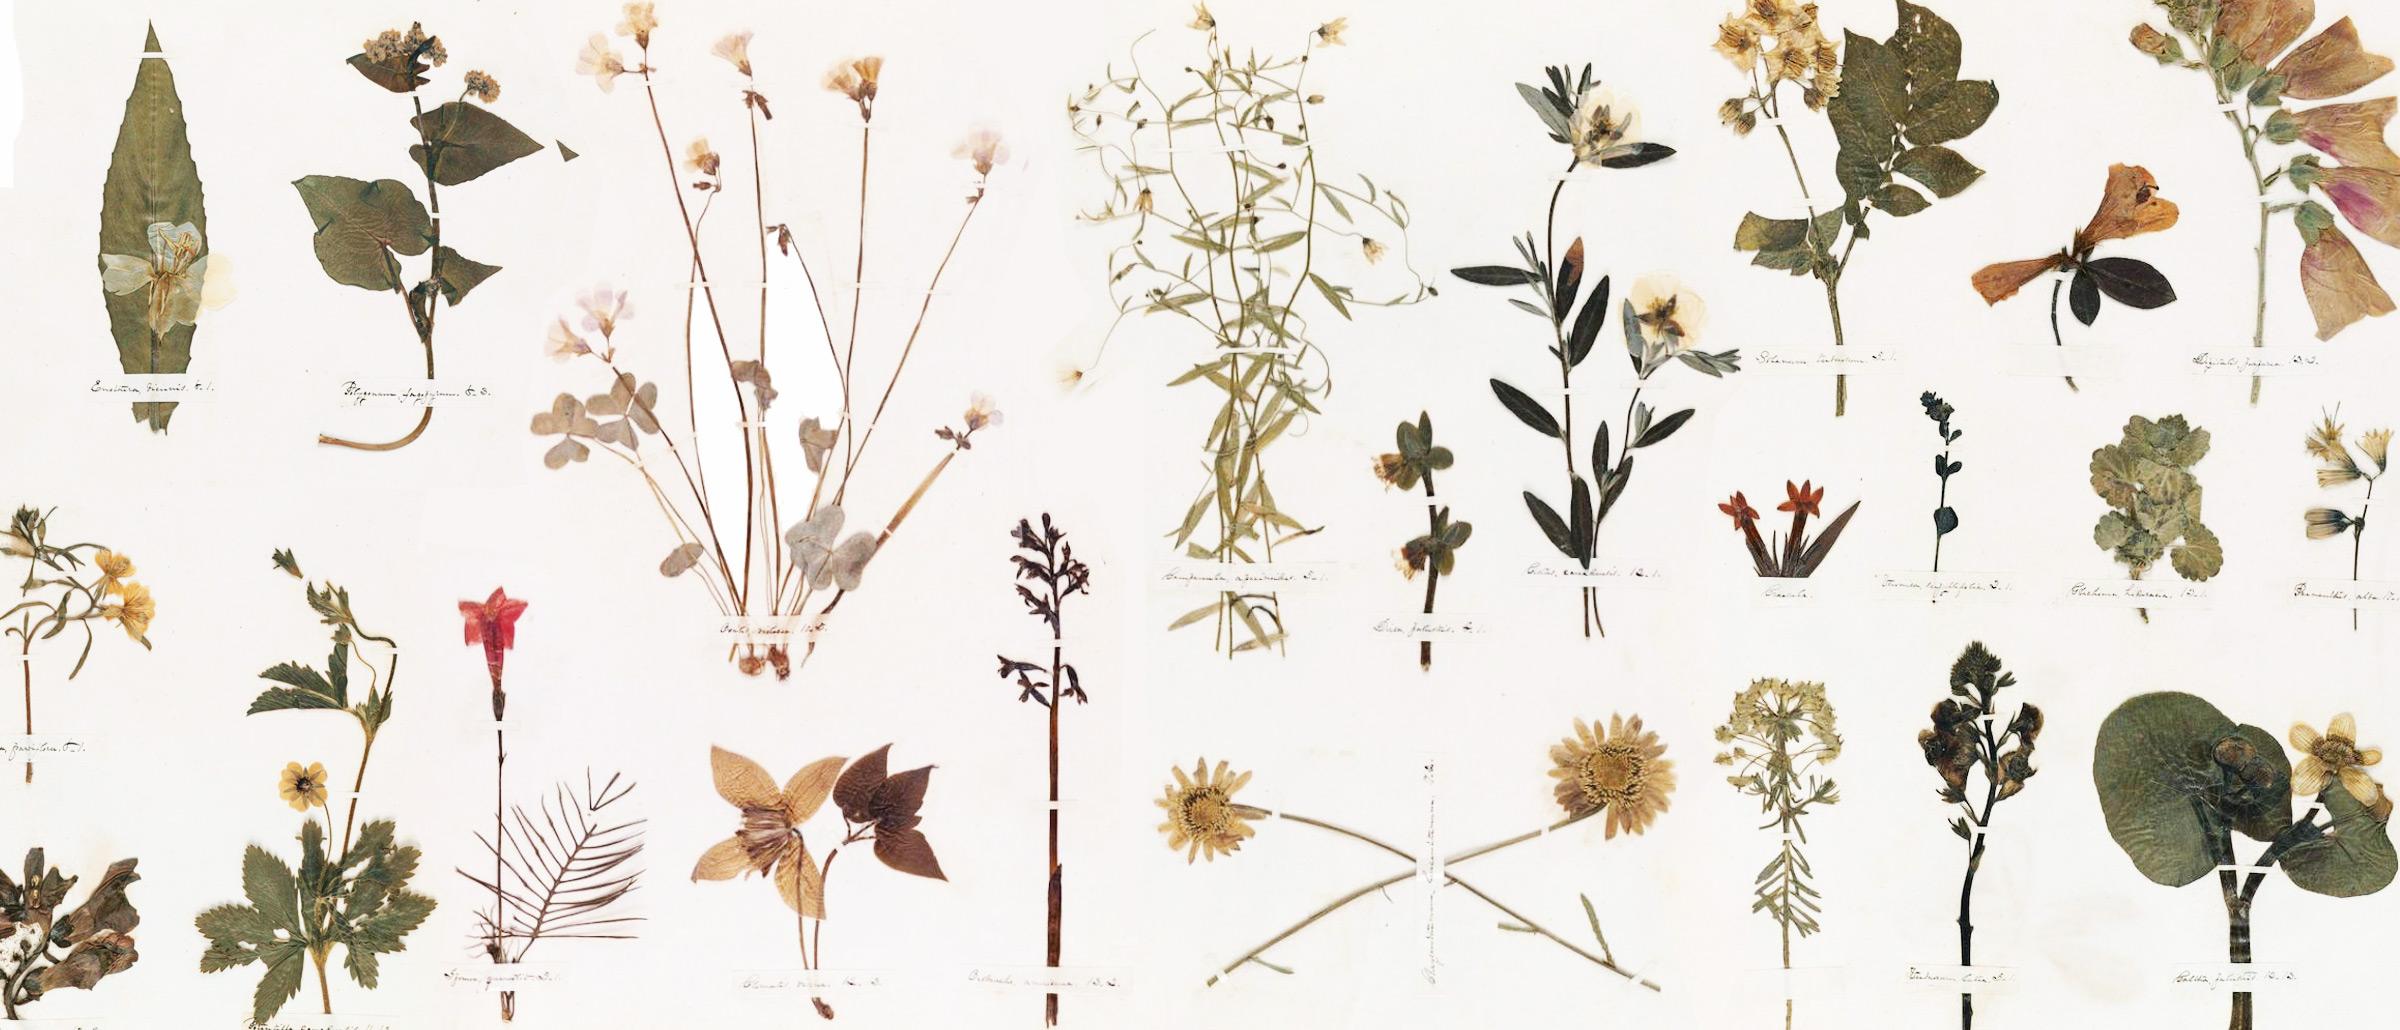 Wallpaper Girl Boy Friend The Planthunter Emily S Herbarium